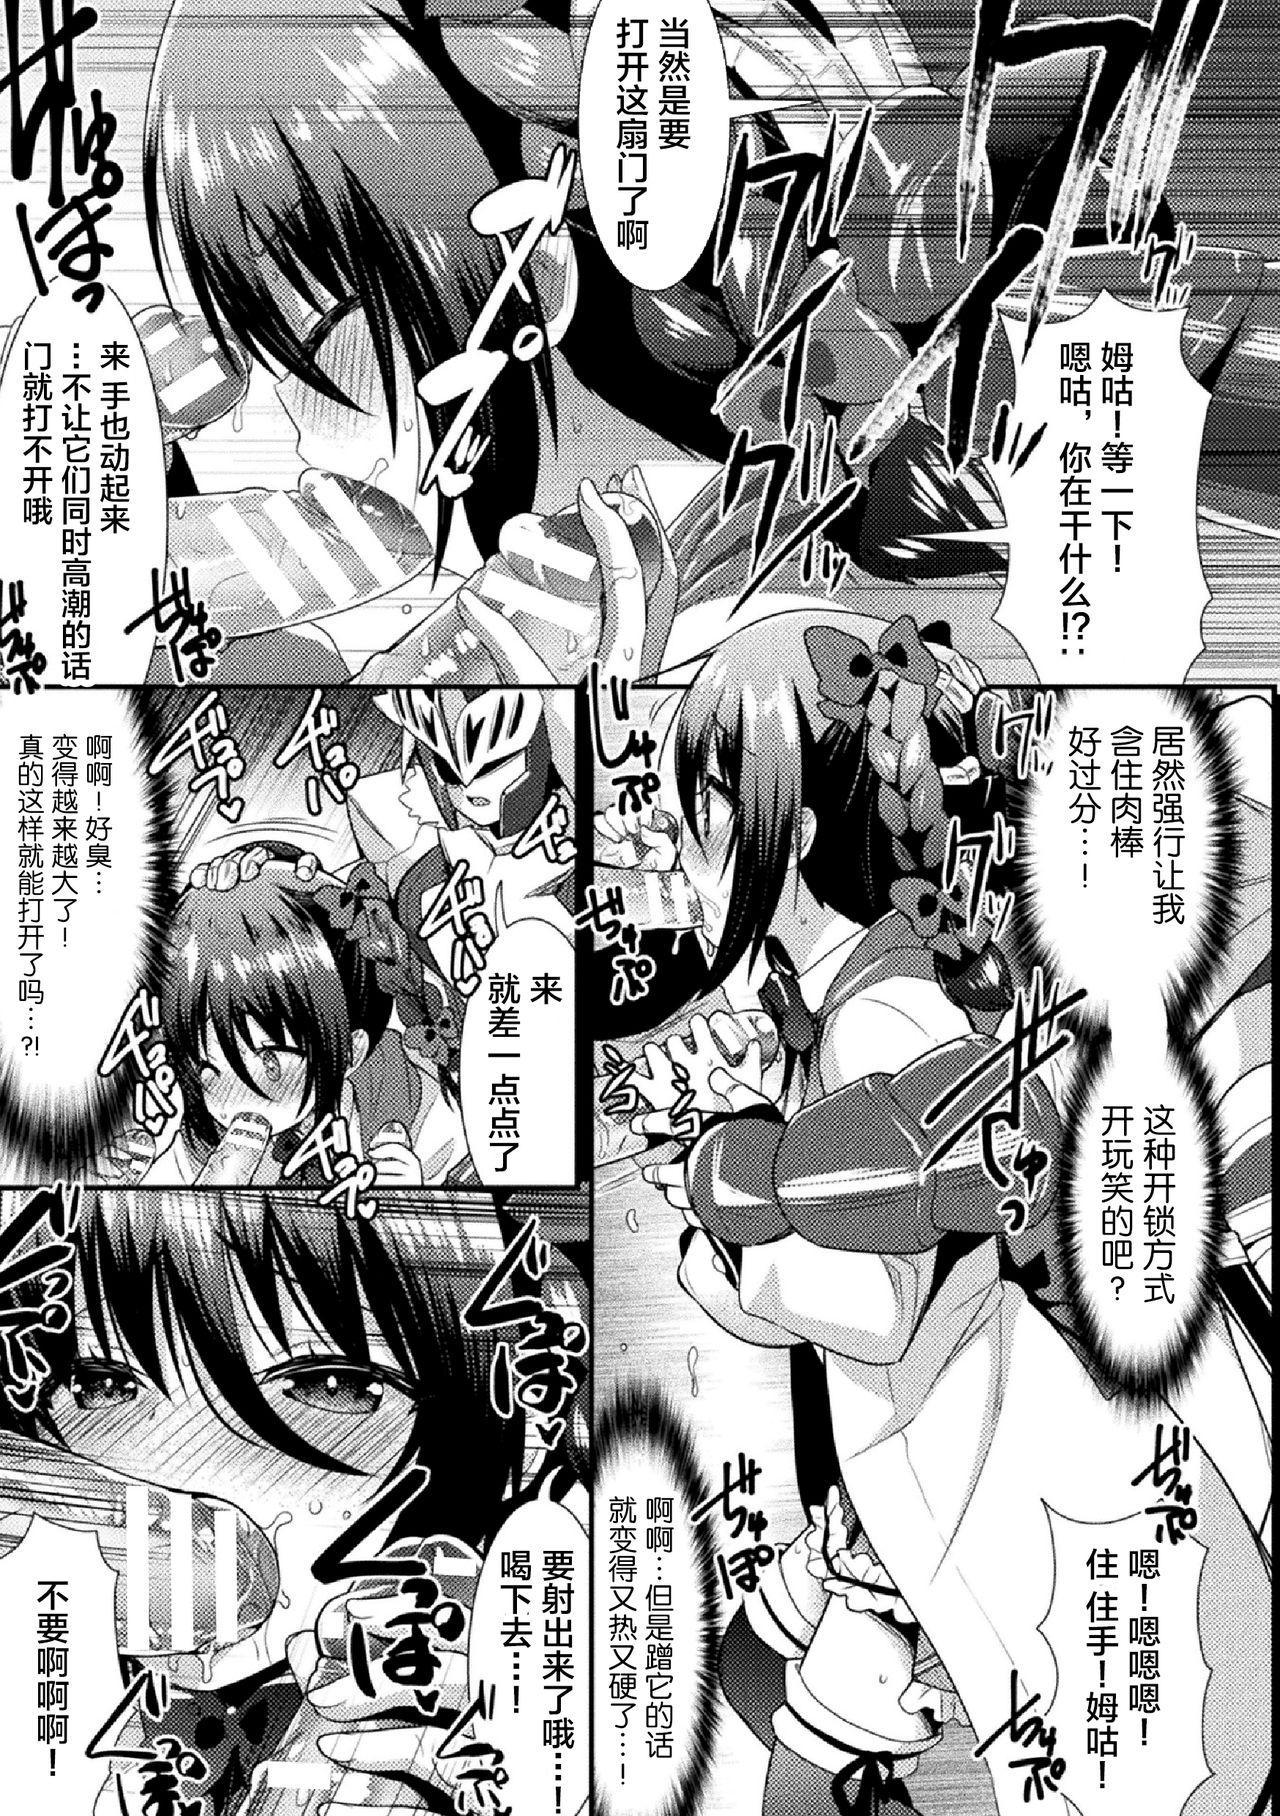 2D Comic Magazine Zecchou Kairaku ga Tomaranai Ero-Trap Dungeon Vol. 2 26